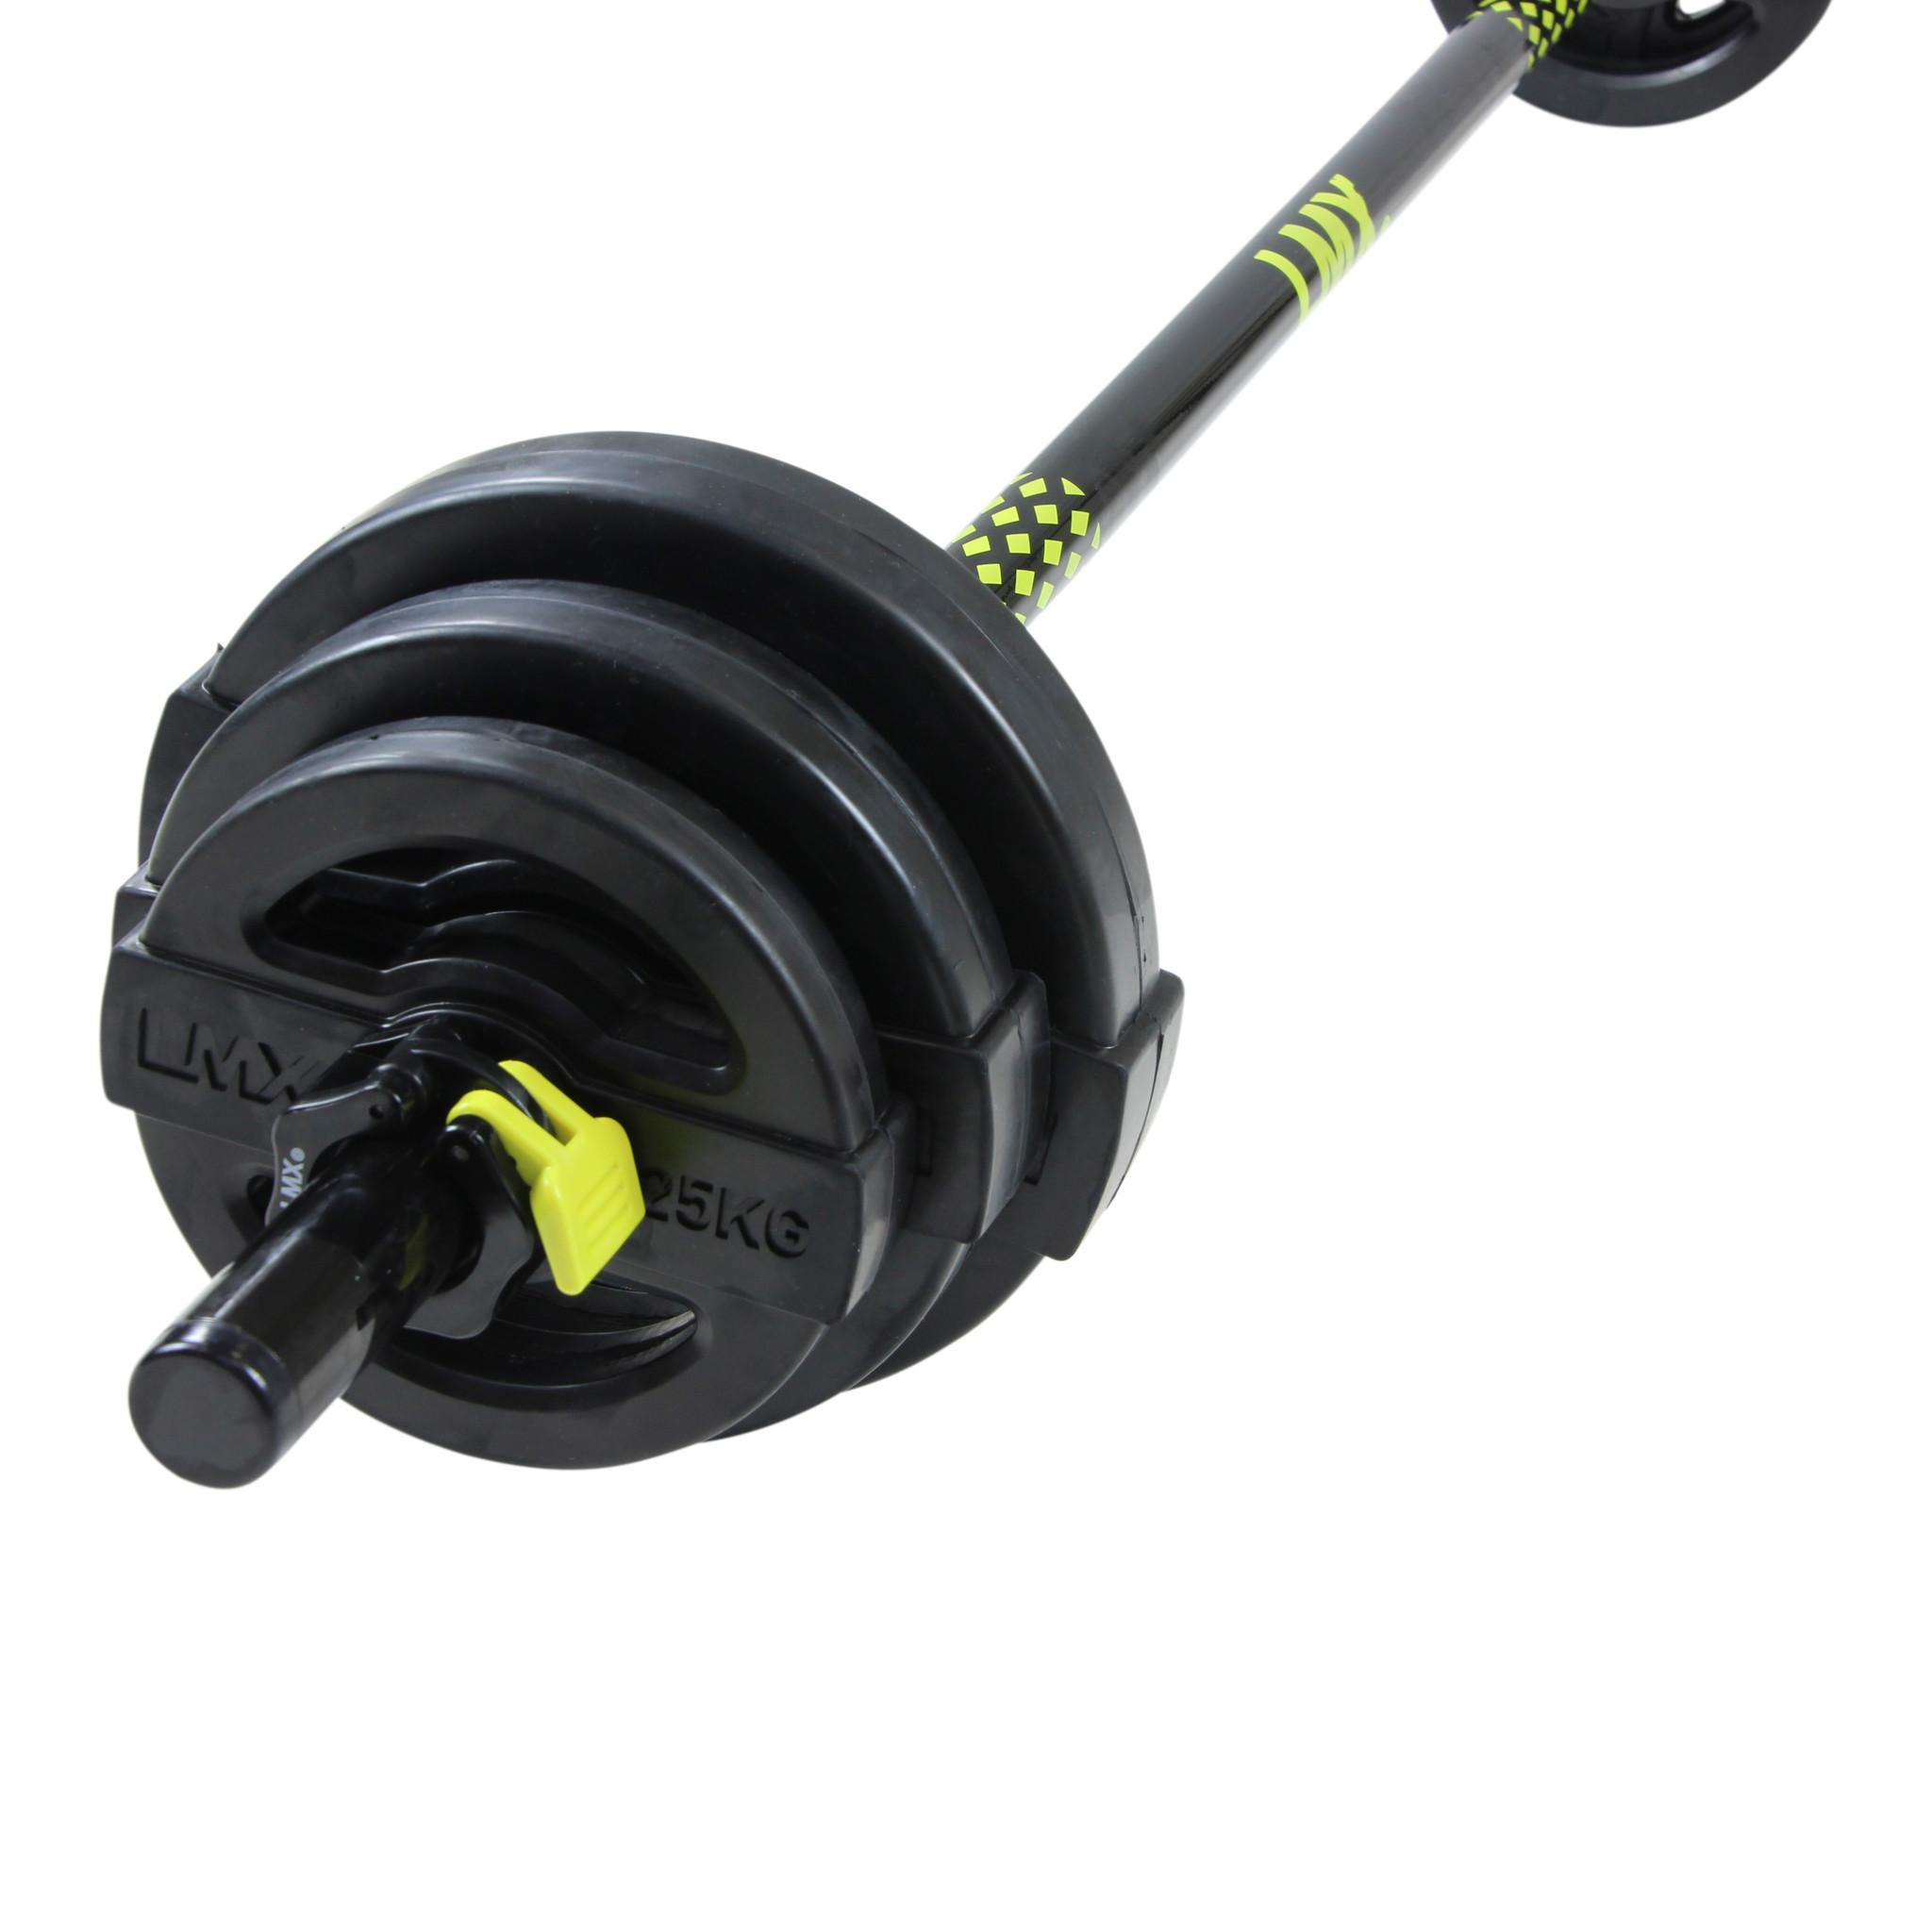 LMX.® LMX1127 LMX. Studio Pump set BLACK (available December)